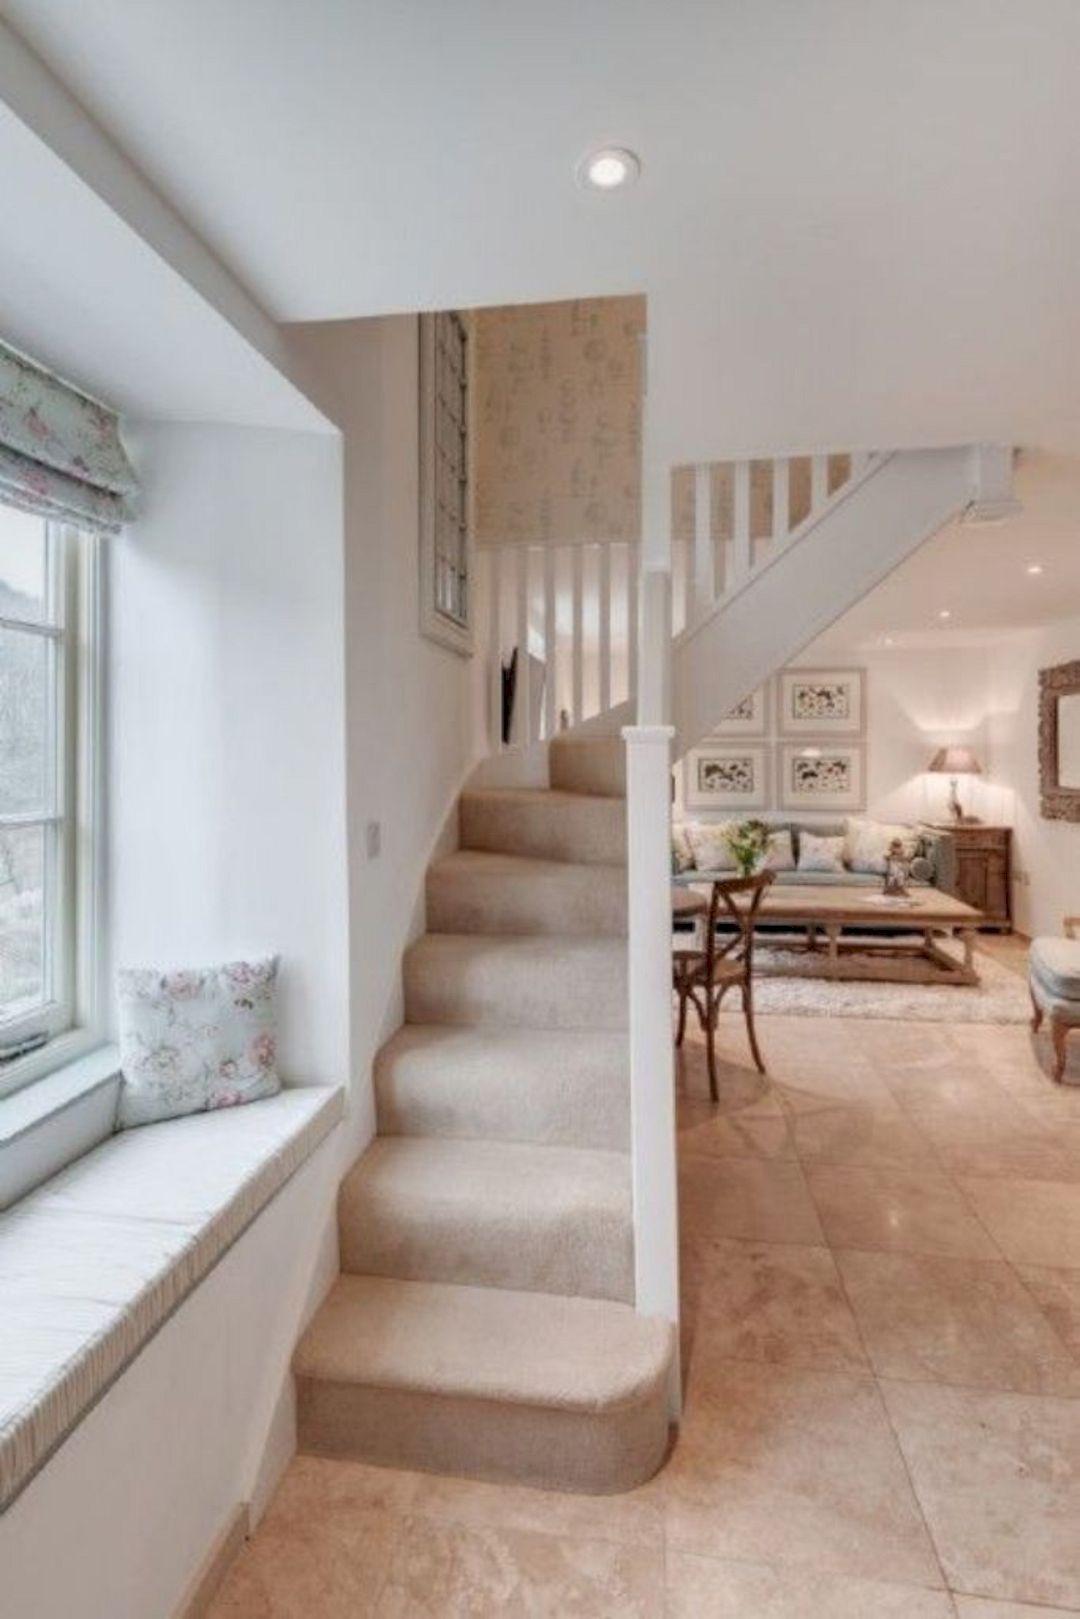 16 Small Cottage Interior Design Ideas Small Cottage Interiors | Staircases For Small Cottages | Open | Small Footprint | Skinny | Corner | Wooden